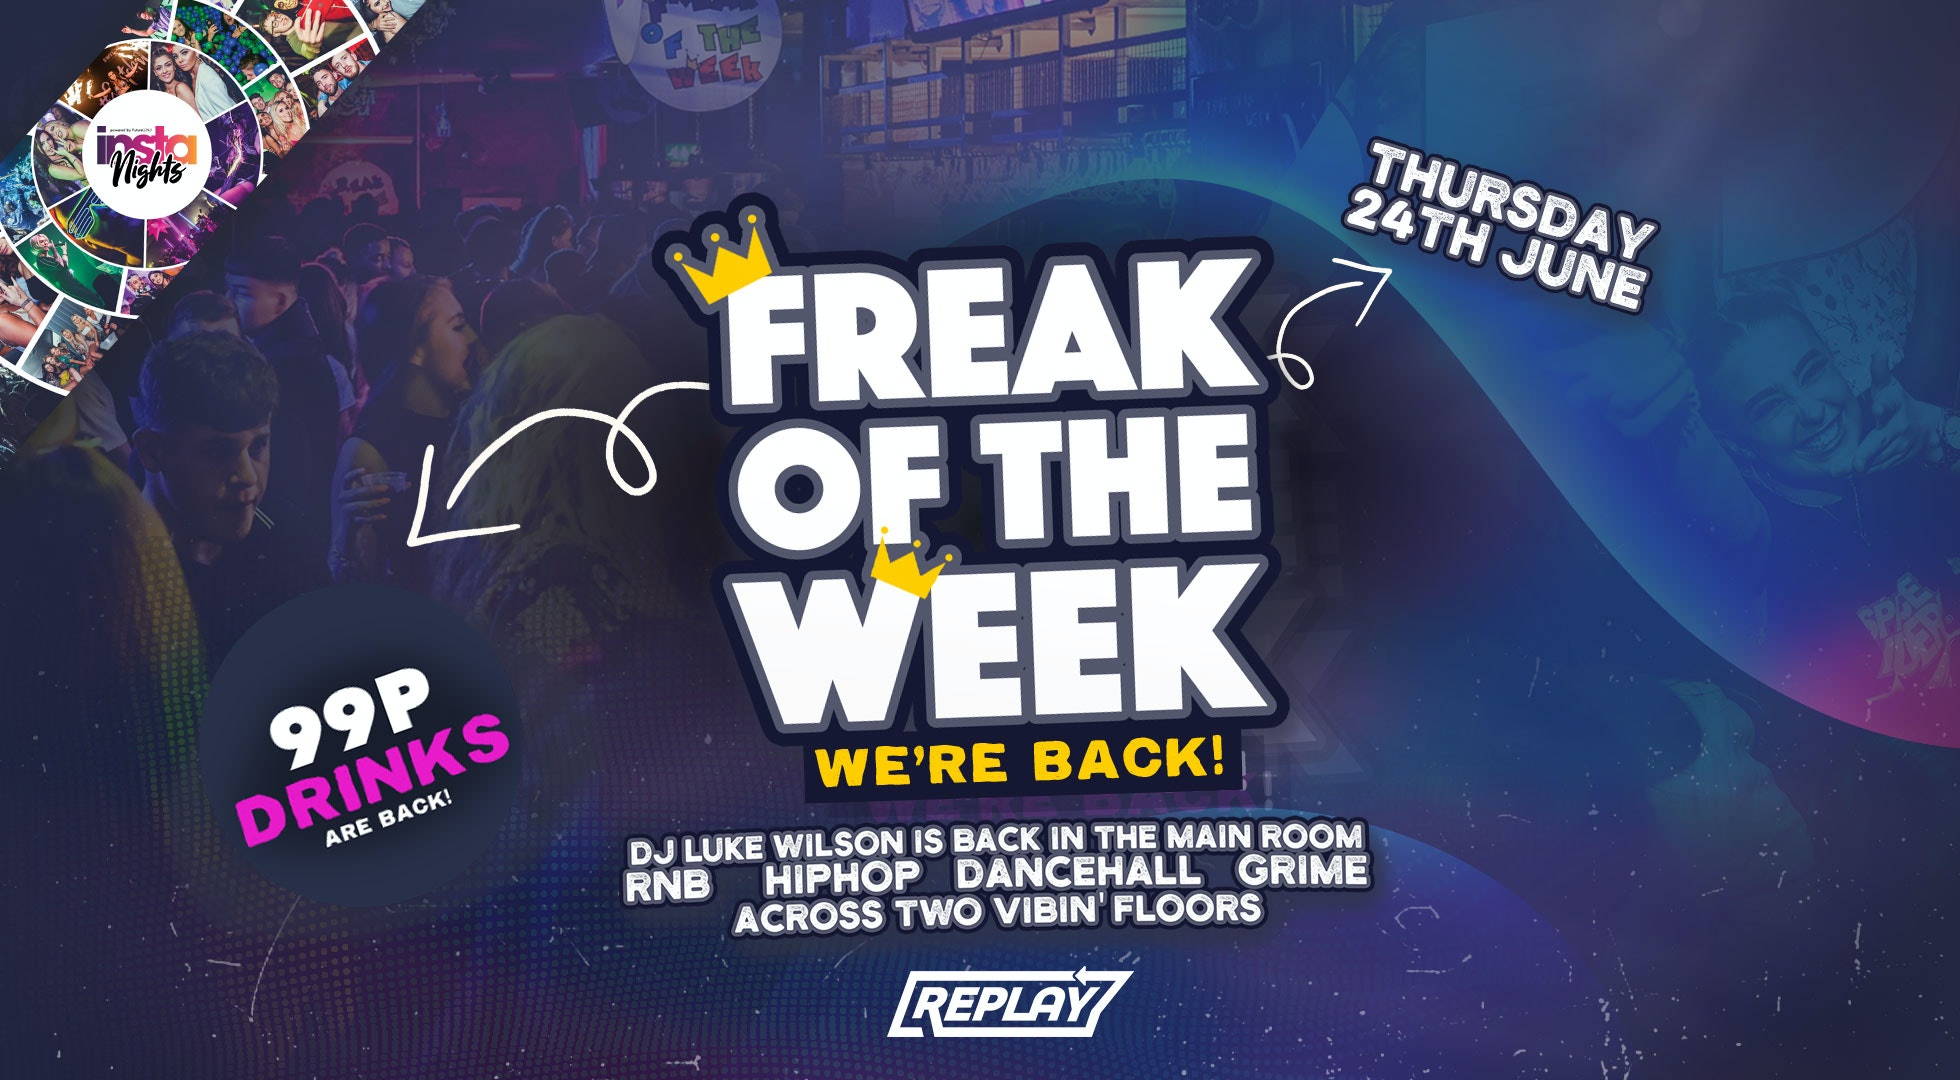 Freak Of The Week *Its BACK* Thursday 24th June 2021